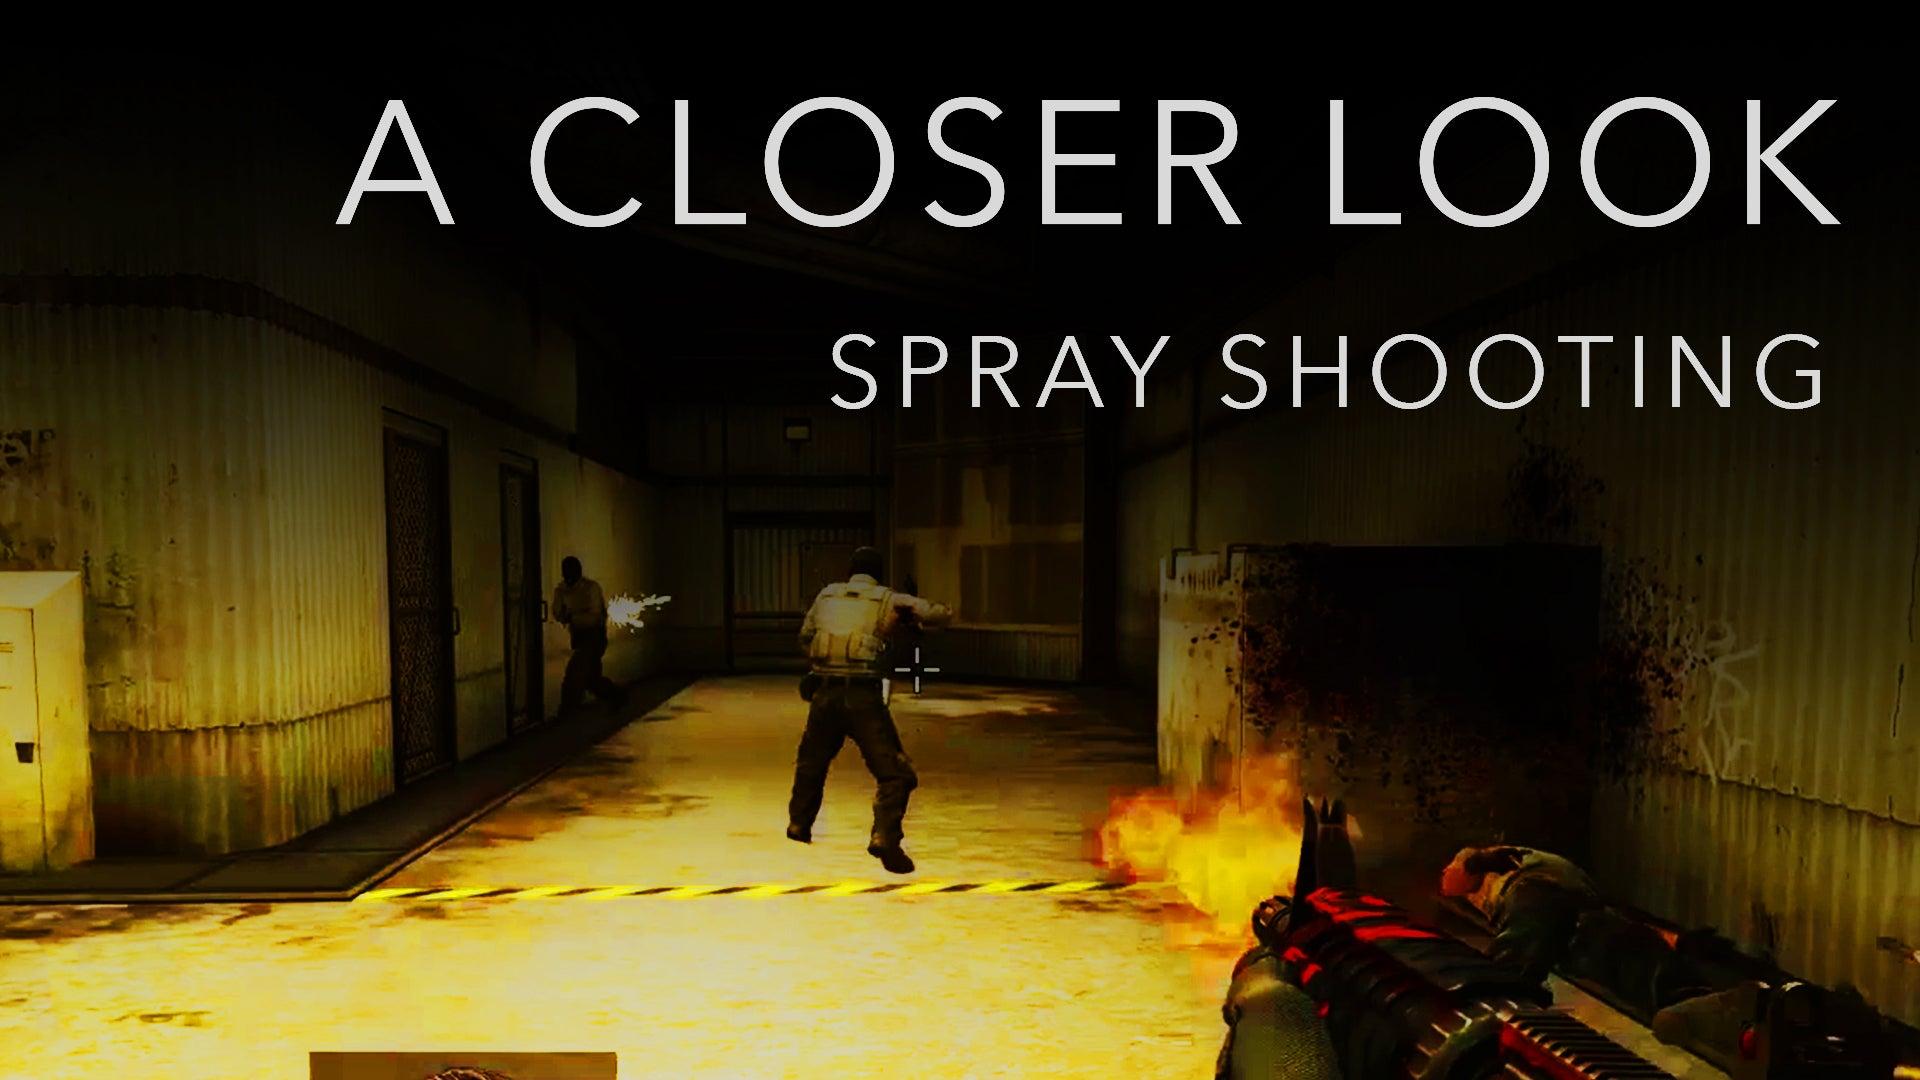 Spray Shooting